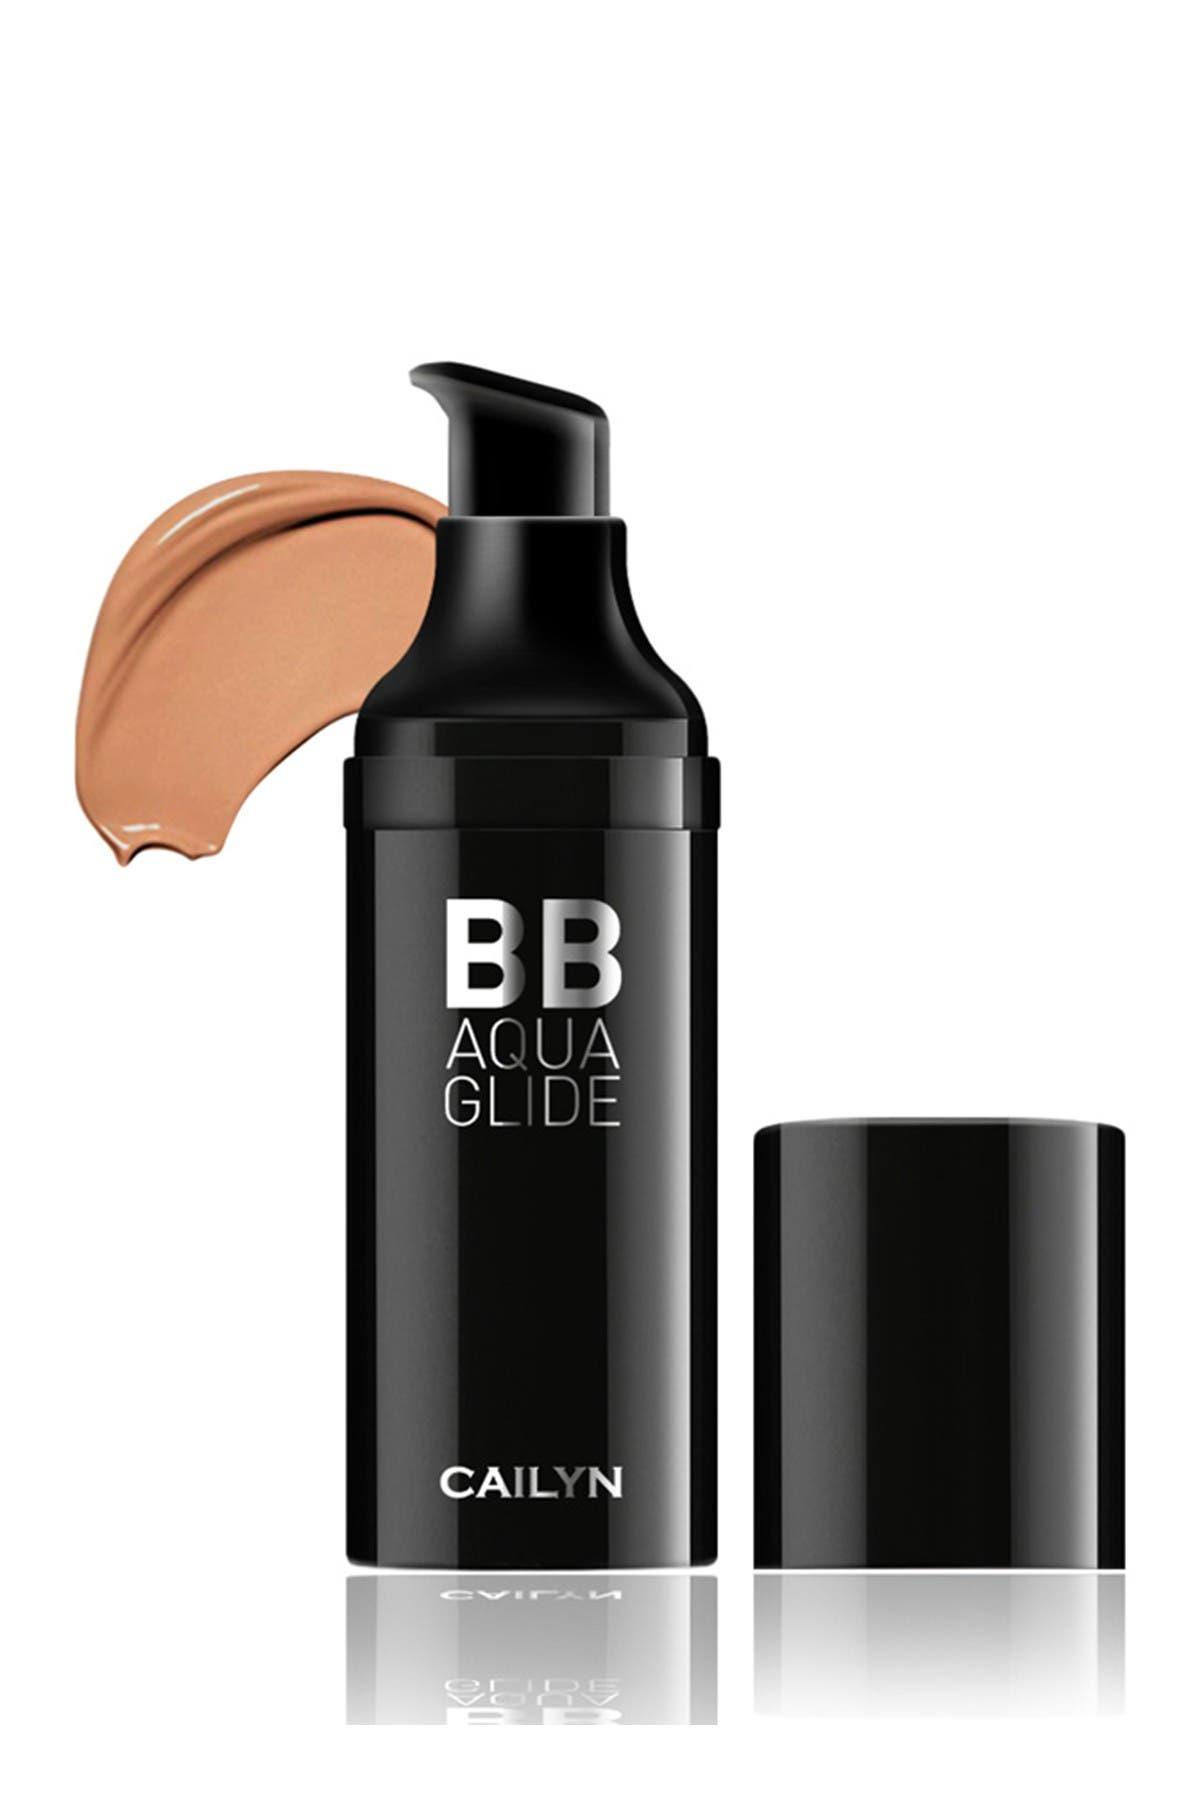 Image of Cailyn Cosmetics BB Aqua Glide 3-in-1 Moisturizer, Primer, & Foundation - Maple